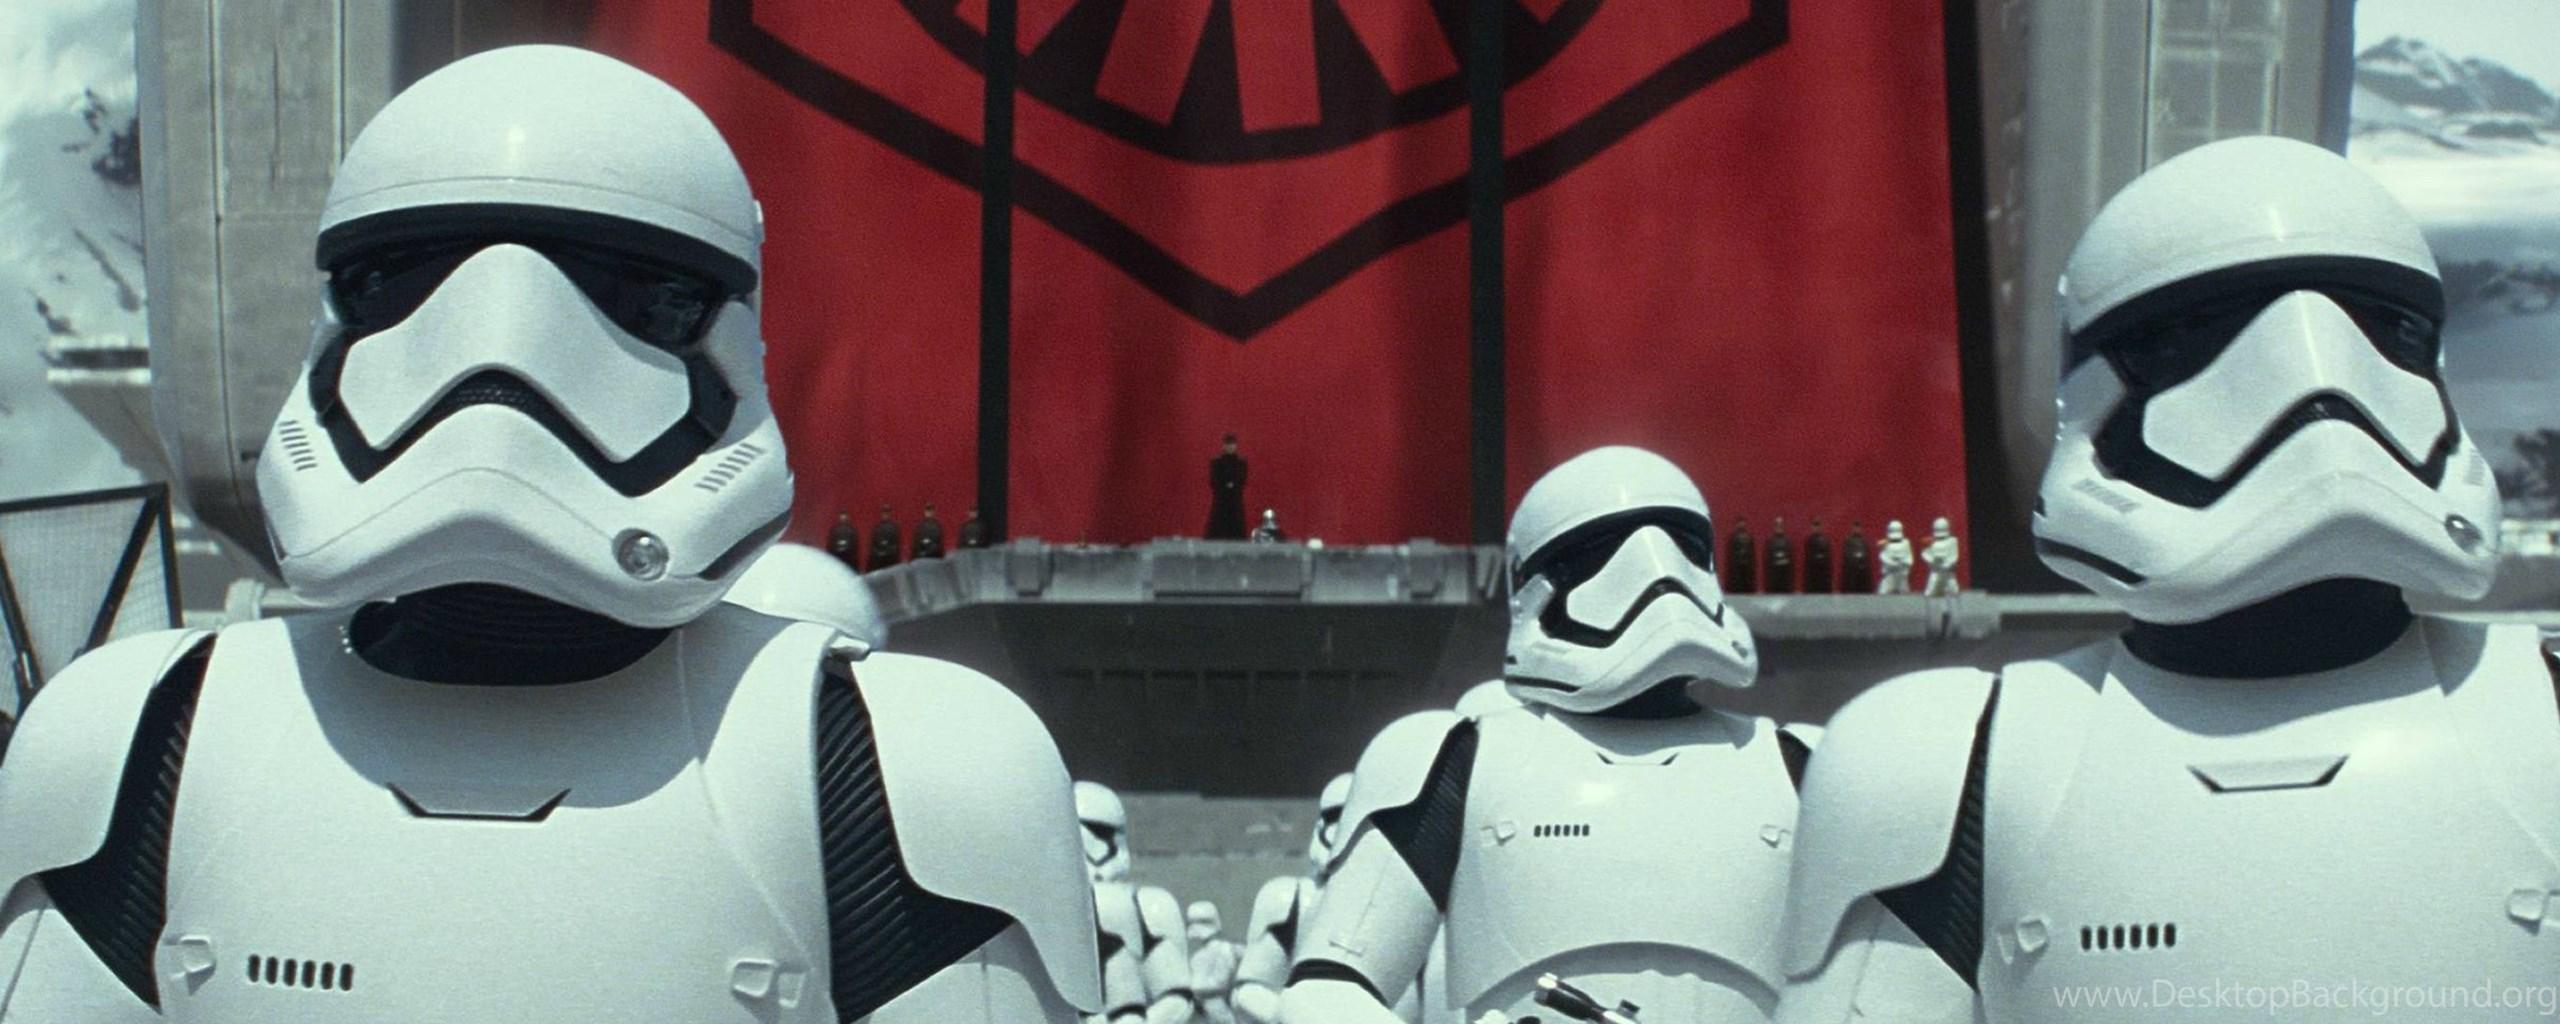 Star Wars Tfa Dual Monitor 3840x1080 Wallpapers Album On Imgur Desktop Background